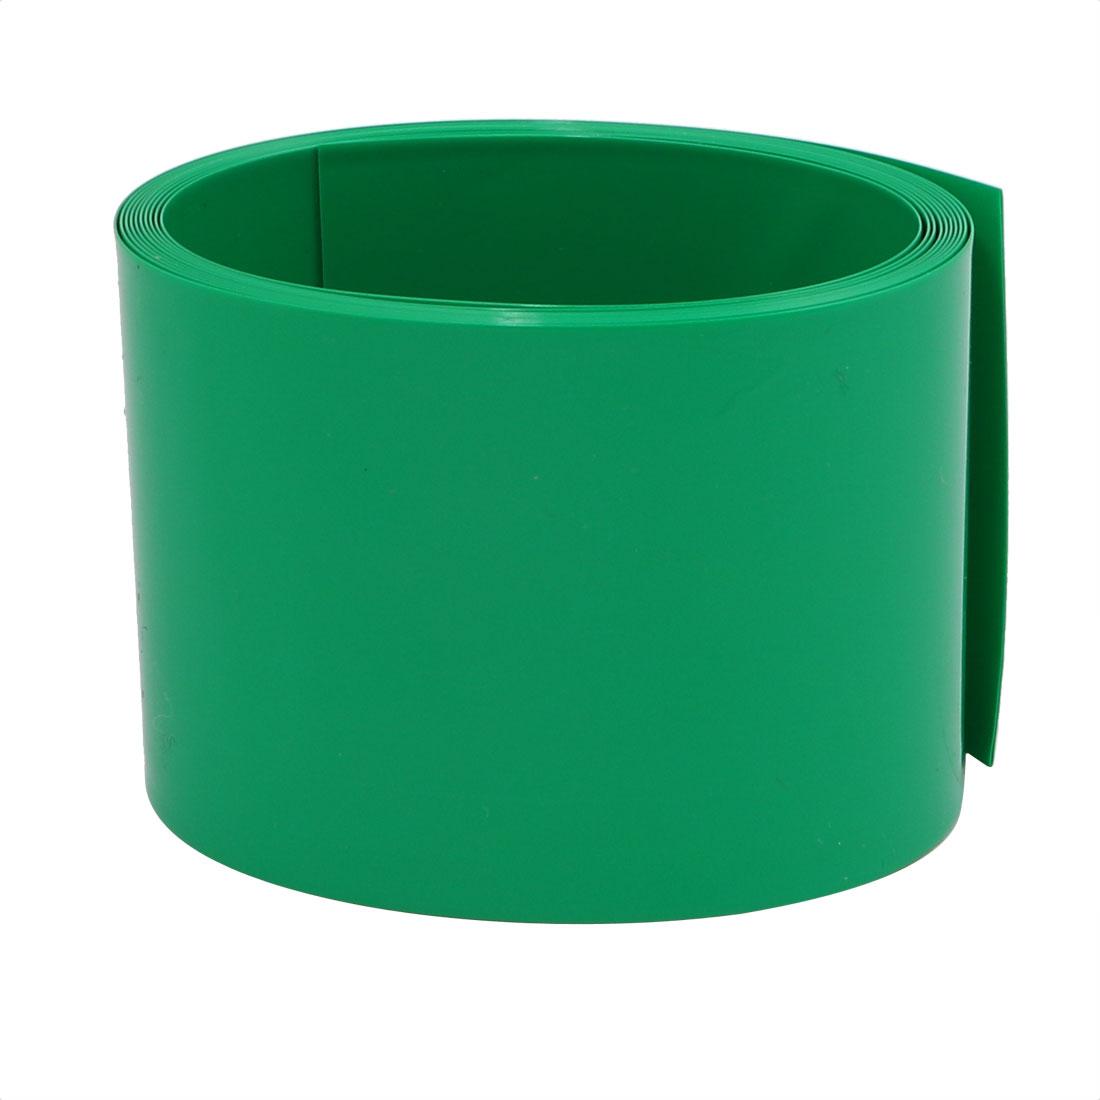 55mm Flat Width 2M Length PVC Heat Shrinkable Tube Green for AAA Batteries